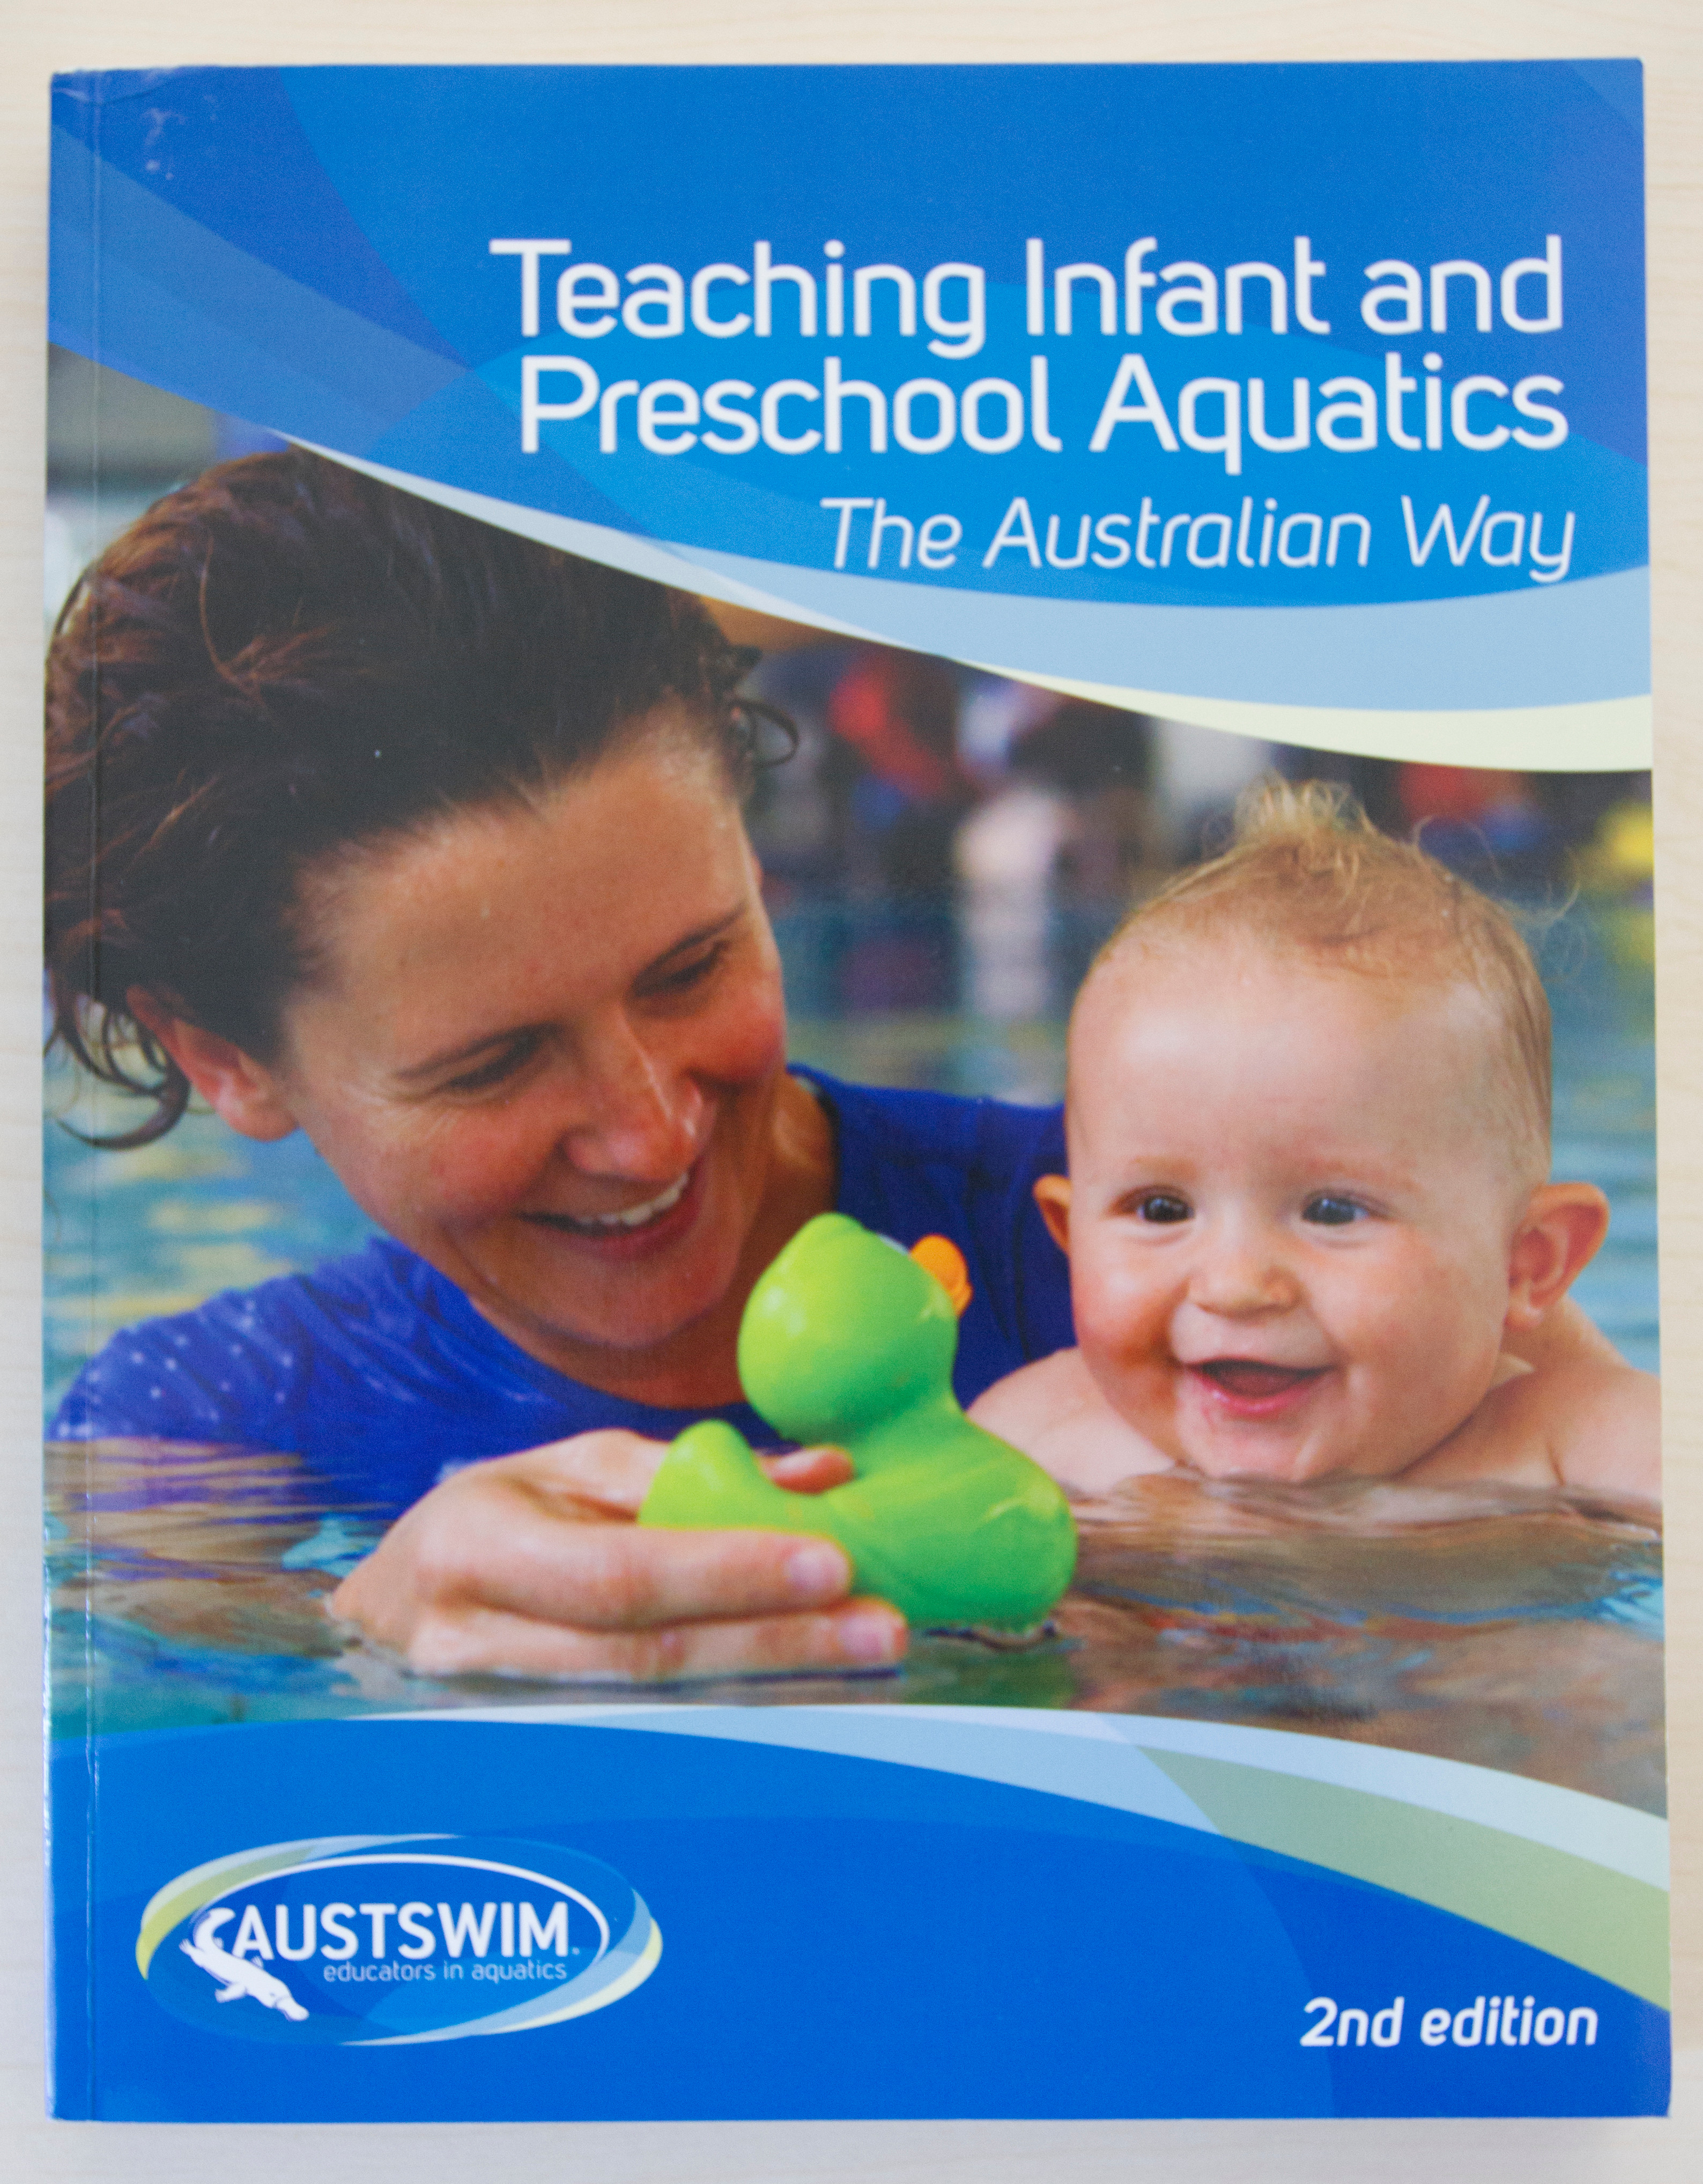 Teaching Infant and Preschool Aquatics